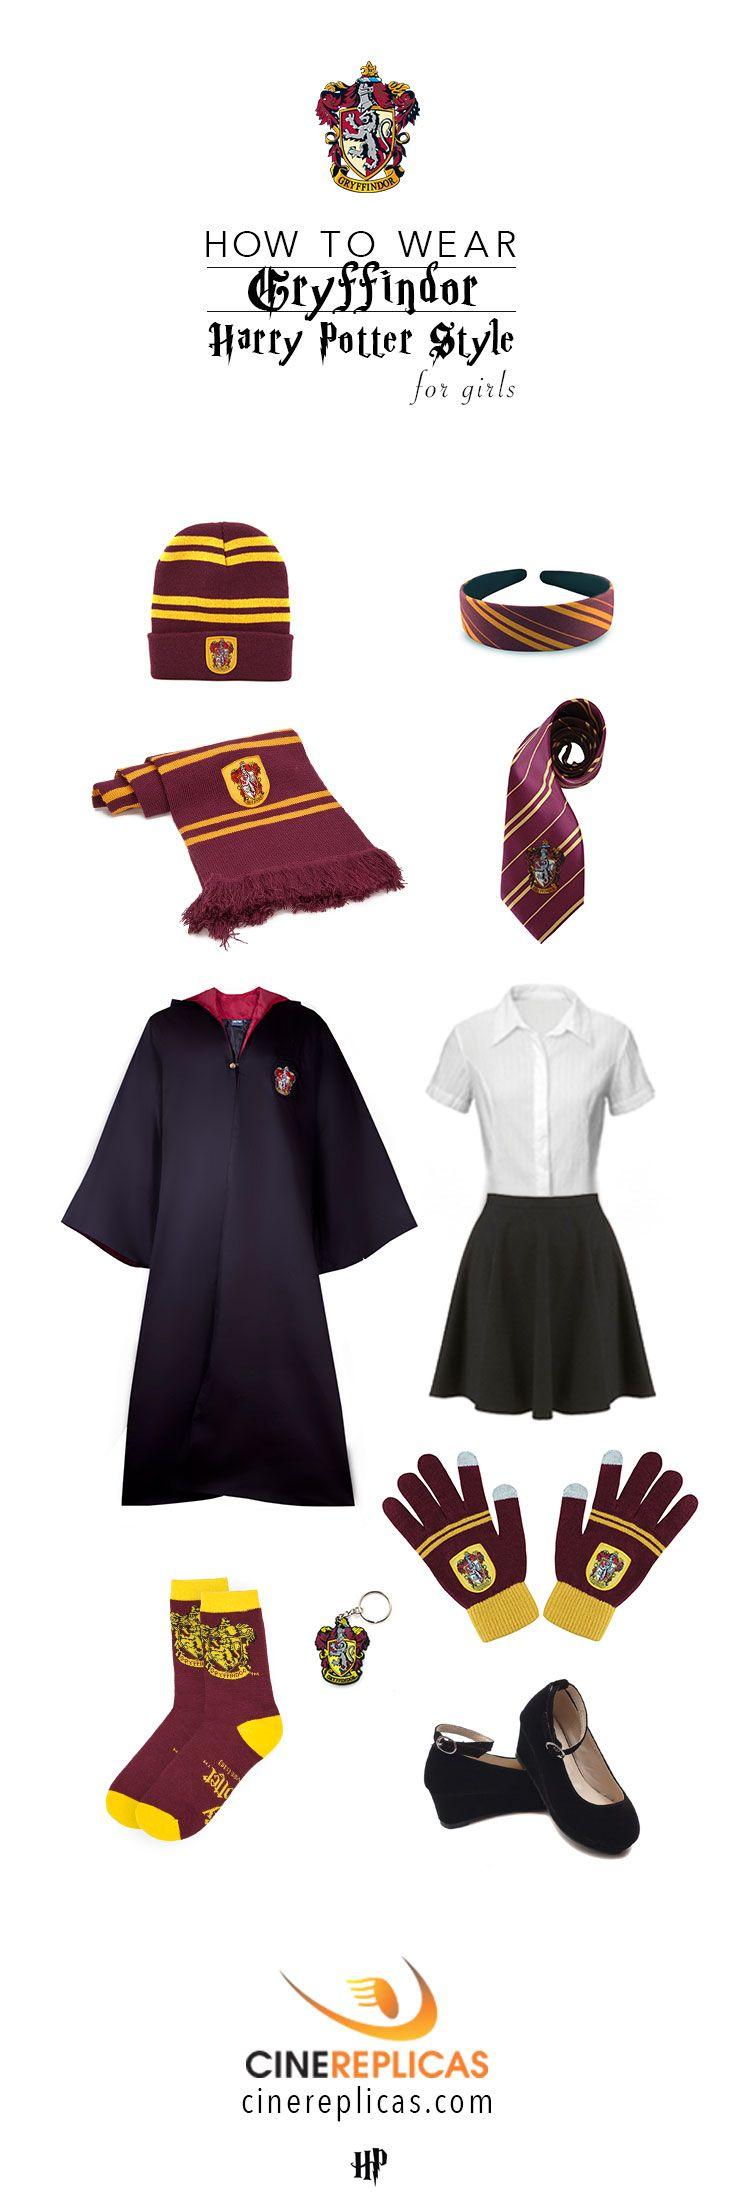 Gryffindor uniform for Girls #HarryPotter  #Gryffindor www.cinereplicas.com